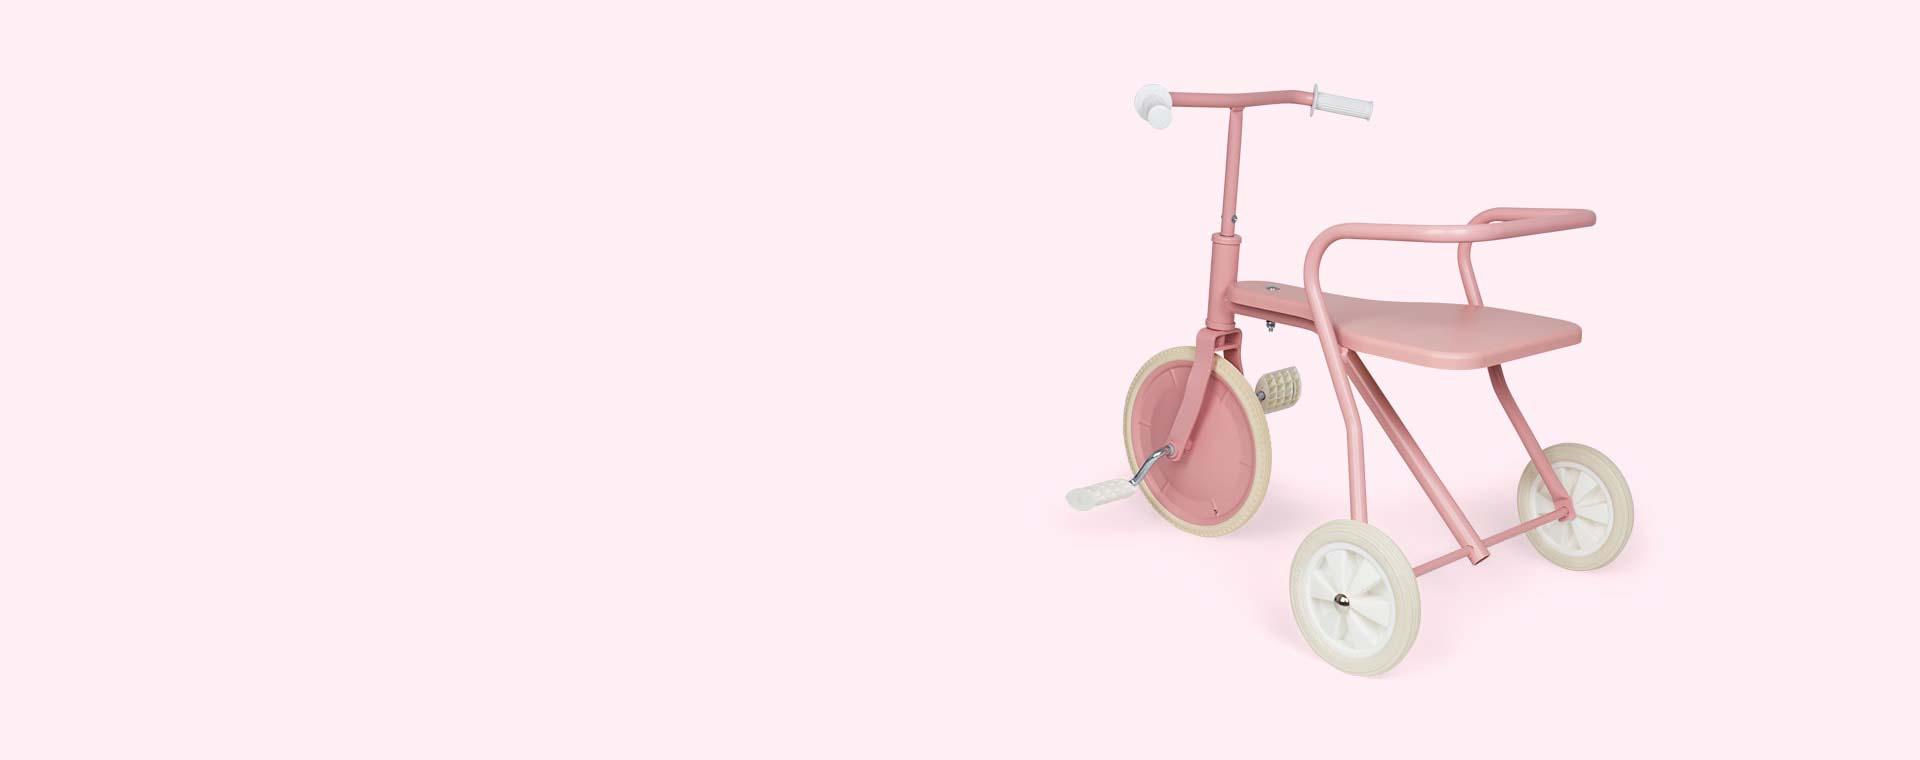 Pink Foxrider Retro Tricycle